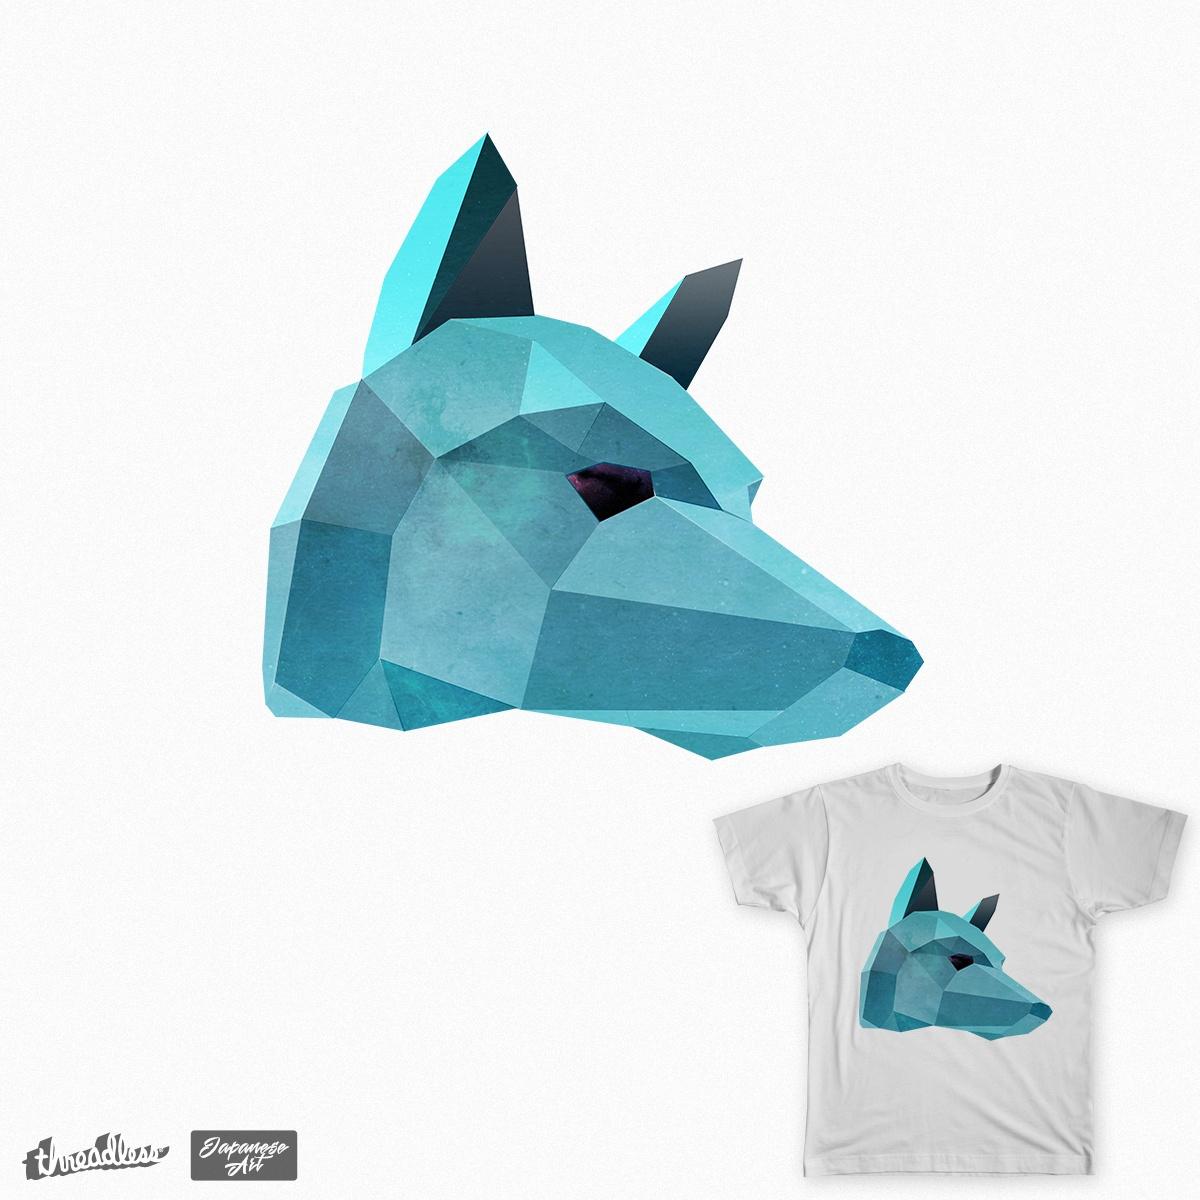 Score Origami Wolf By Bionicchipmunk On Threadless